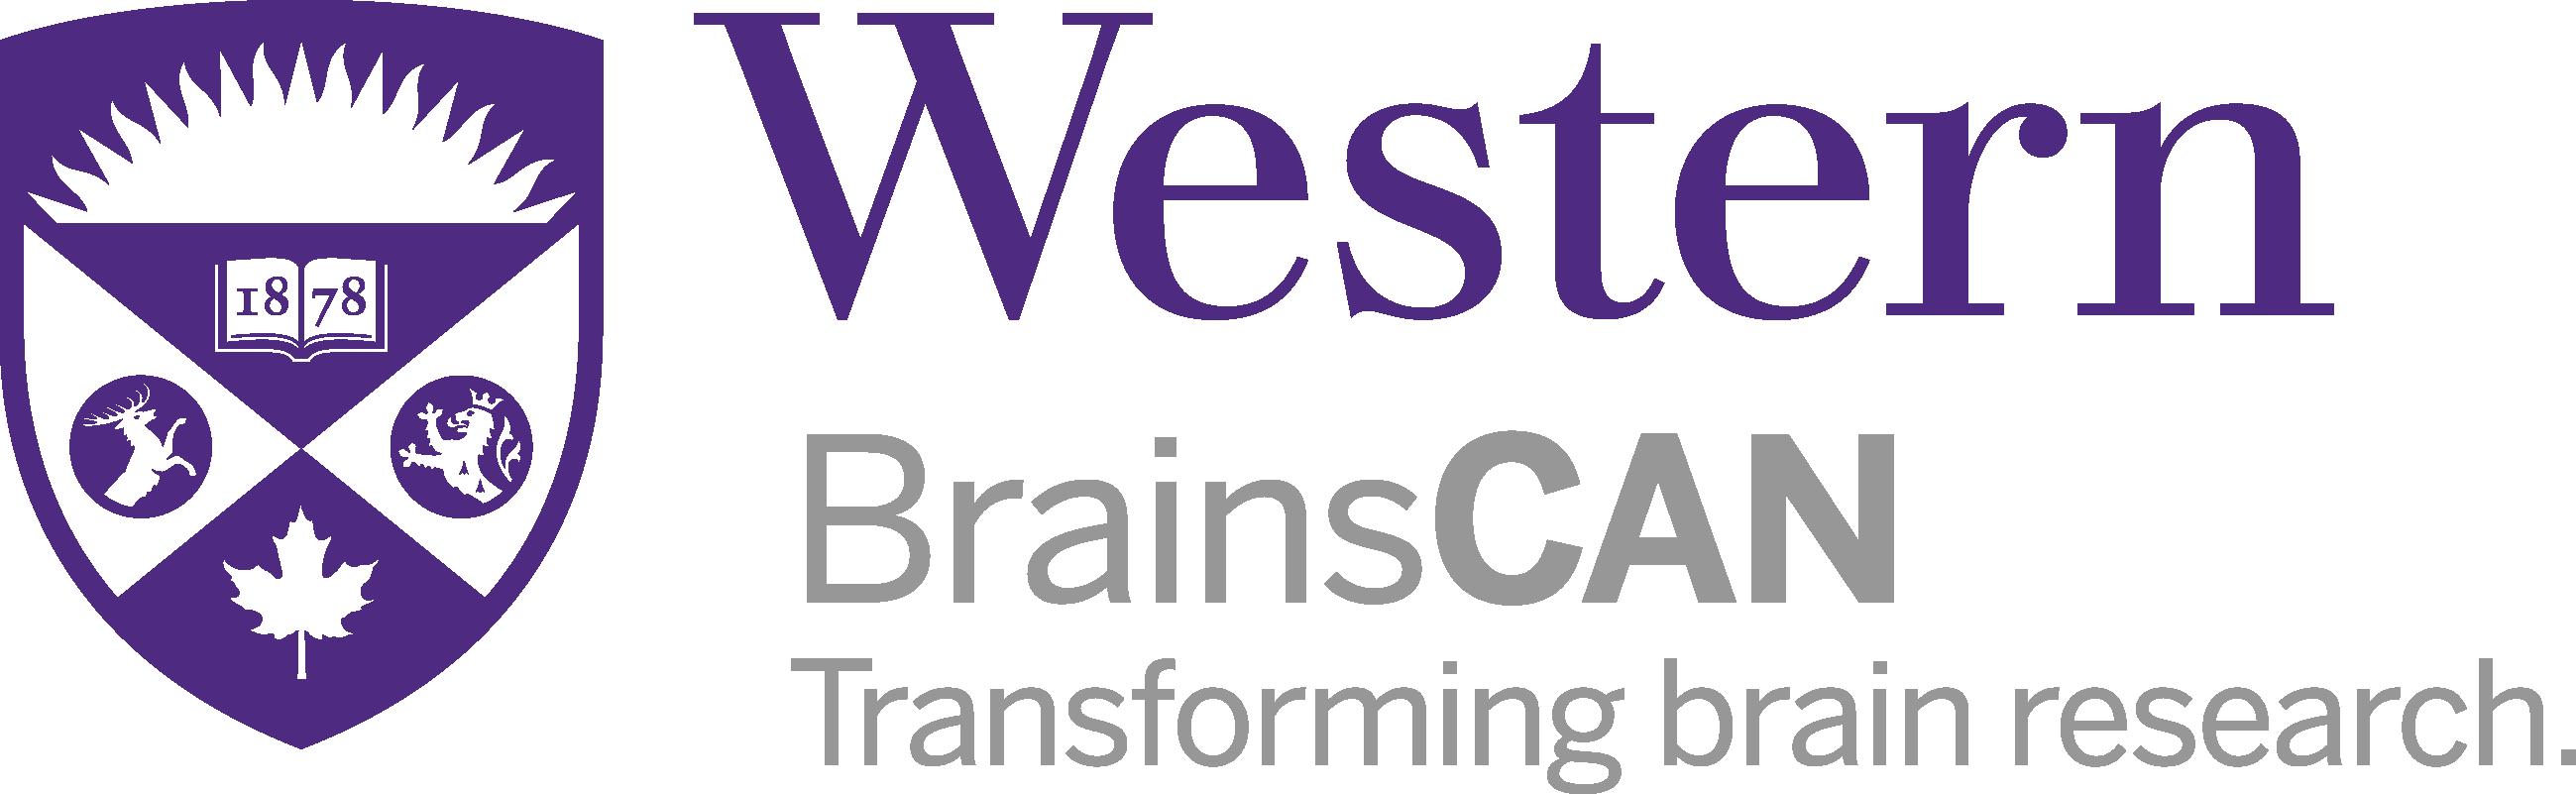 BrainsCAN logo